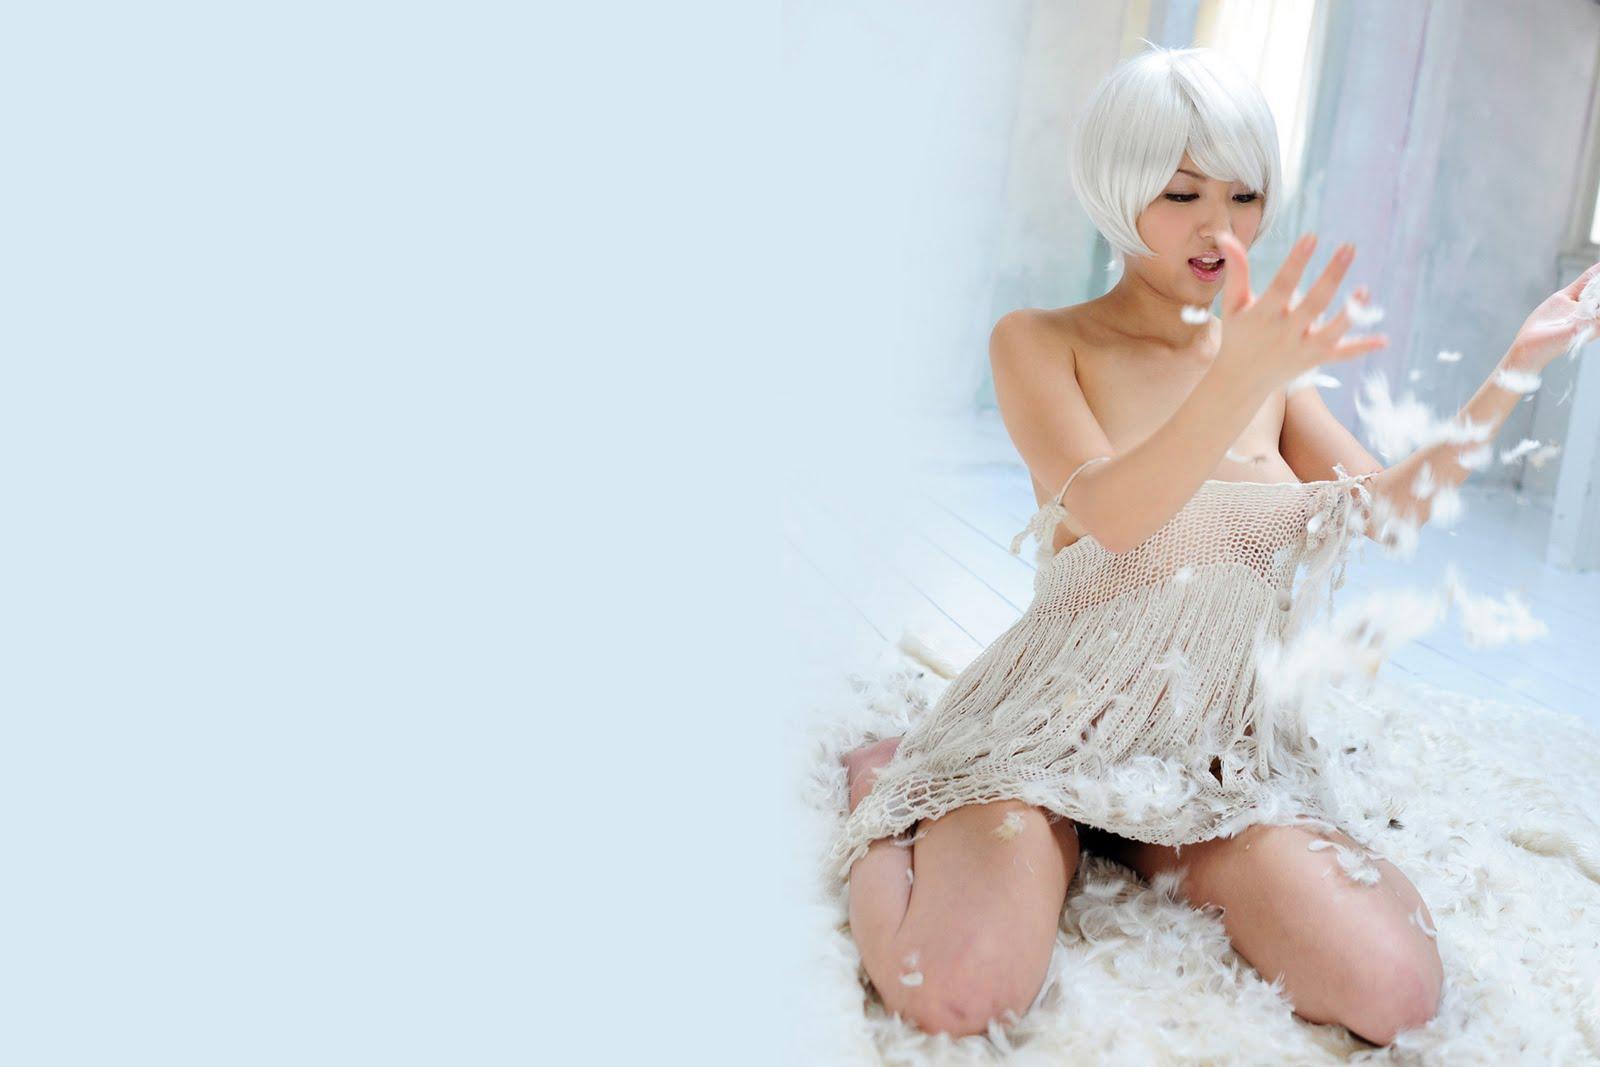 http://3.bp.blogspot.com/-nYmP_fJnFHE/TeQgKDU-_HI/AAAAAAAACWU/fcaOgPwuNAs/s1600/japanese+cute+sexy+girl+wallpaper+%25282%2529.jpg